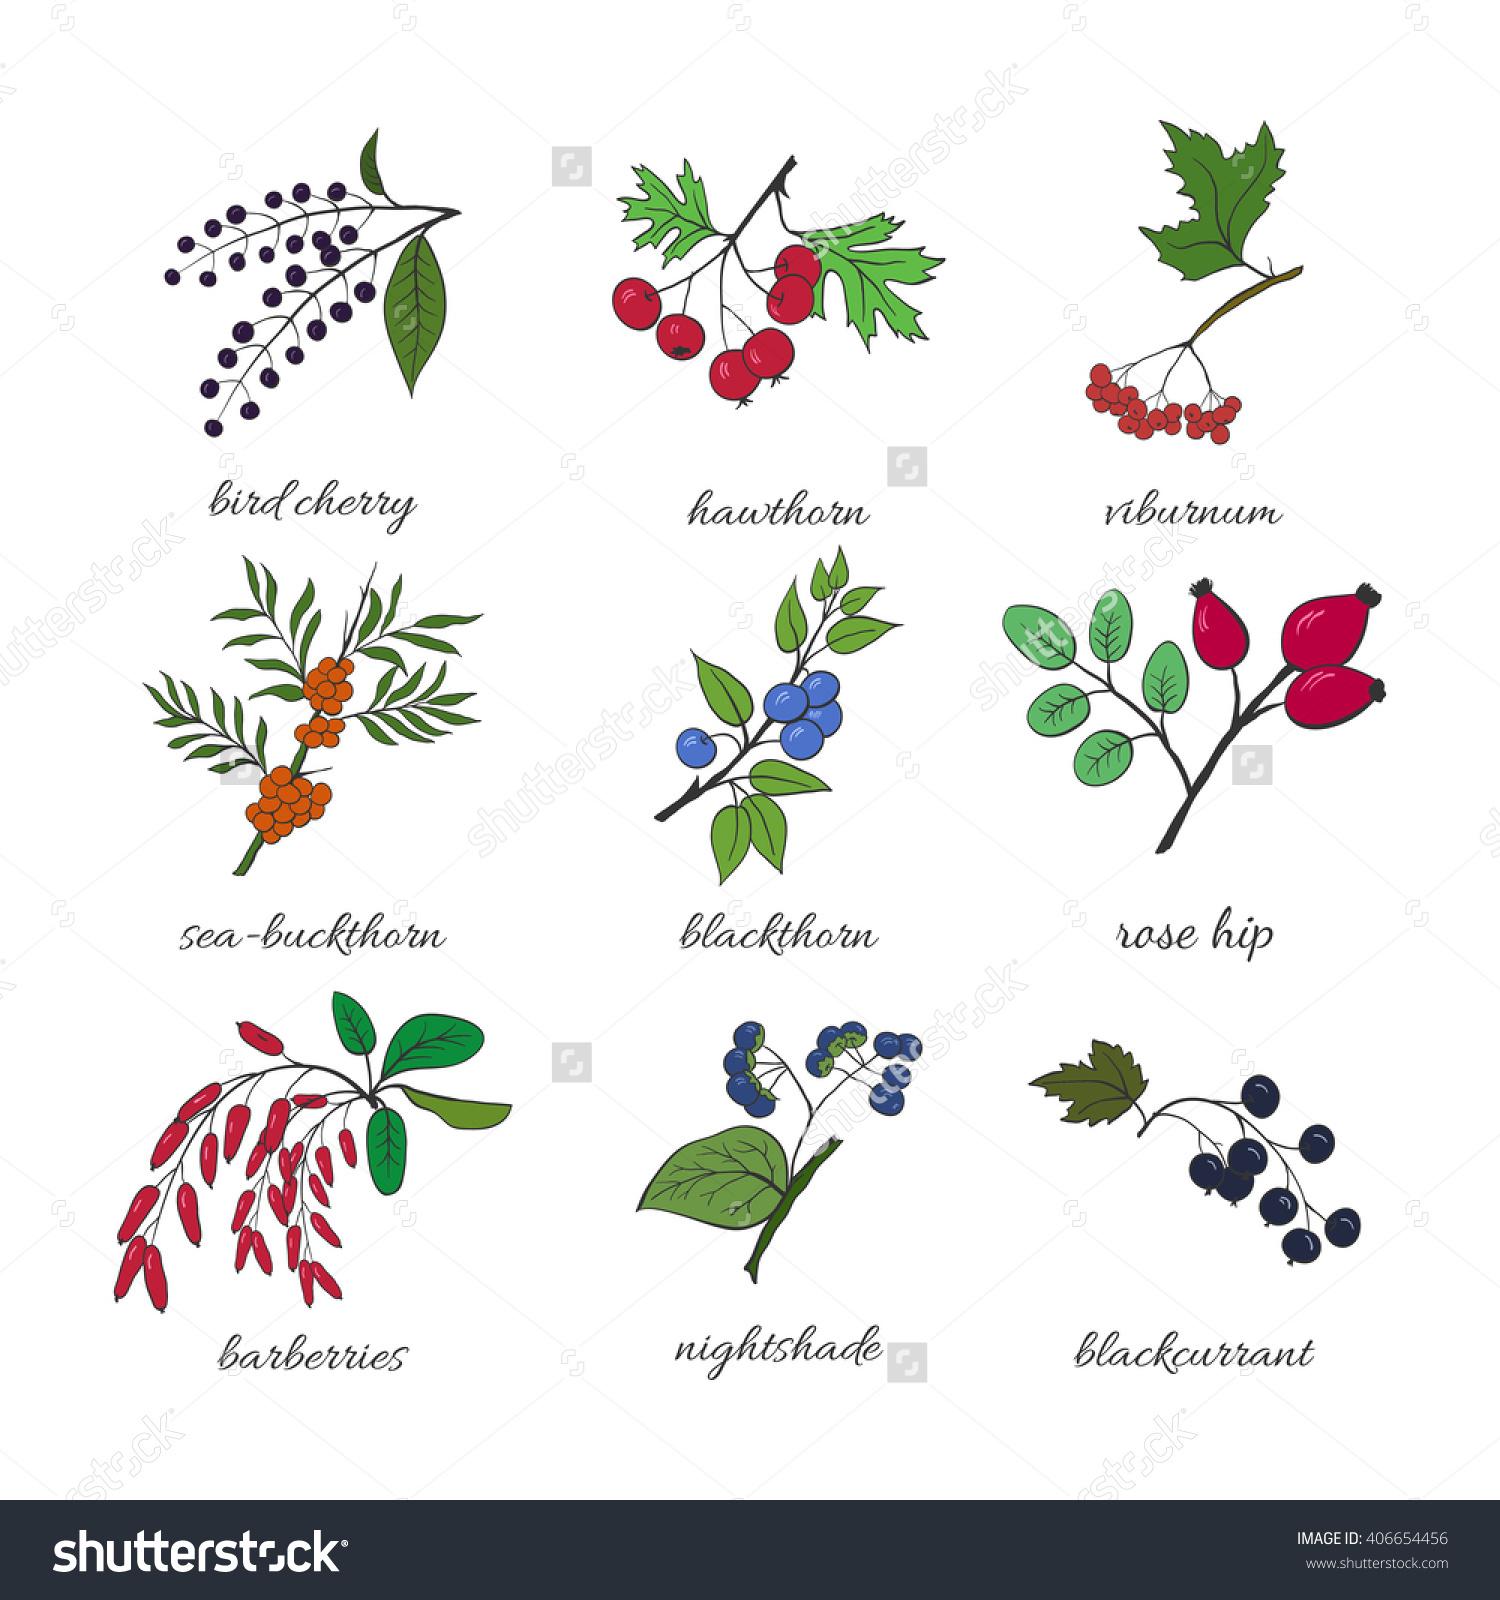 Medicinal Berry Collection. Bird Cherry, Blackthorn, Viburnum, Sea.